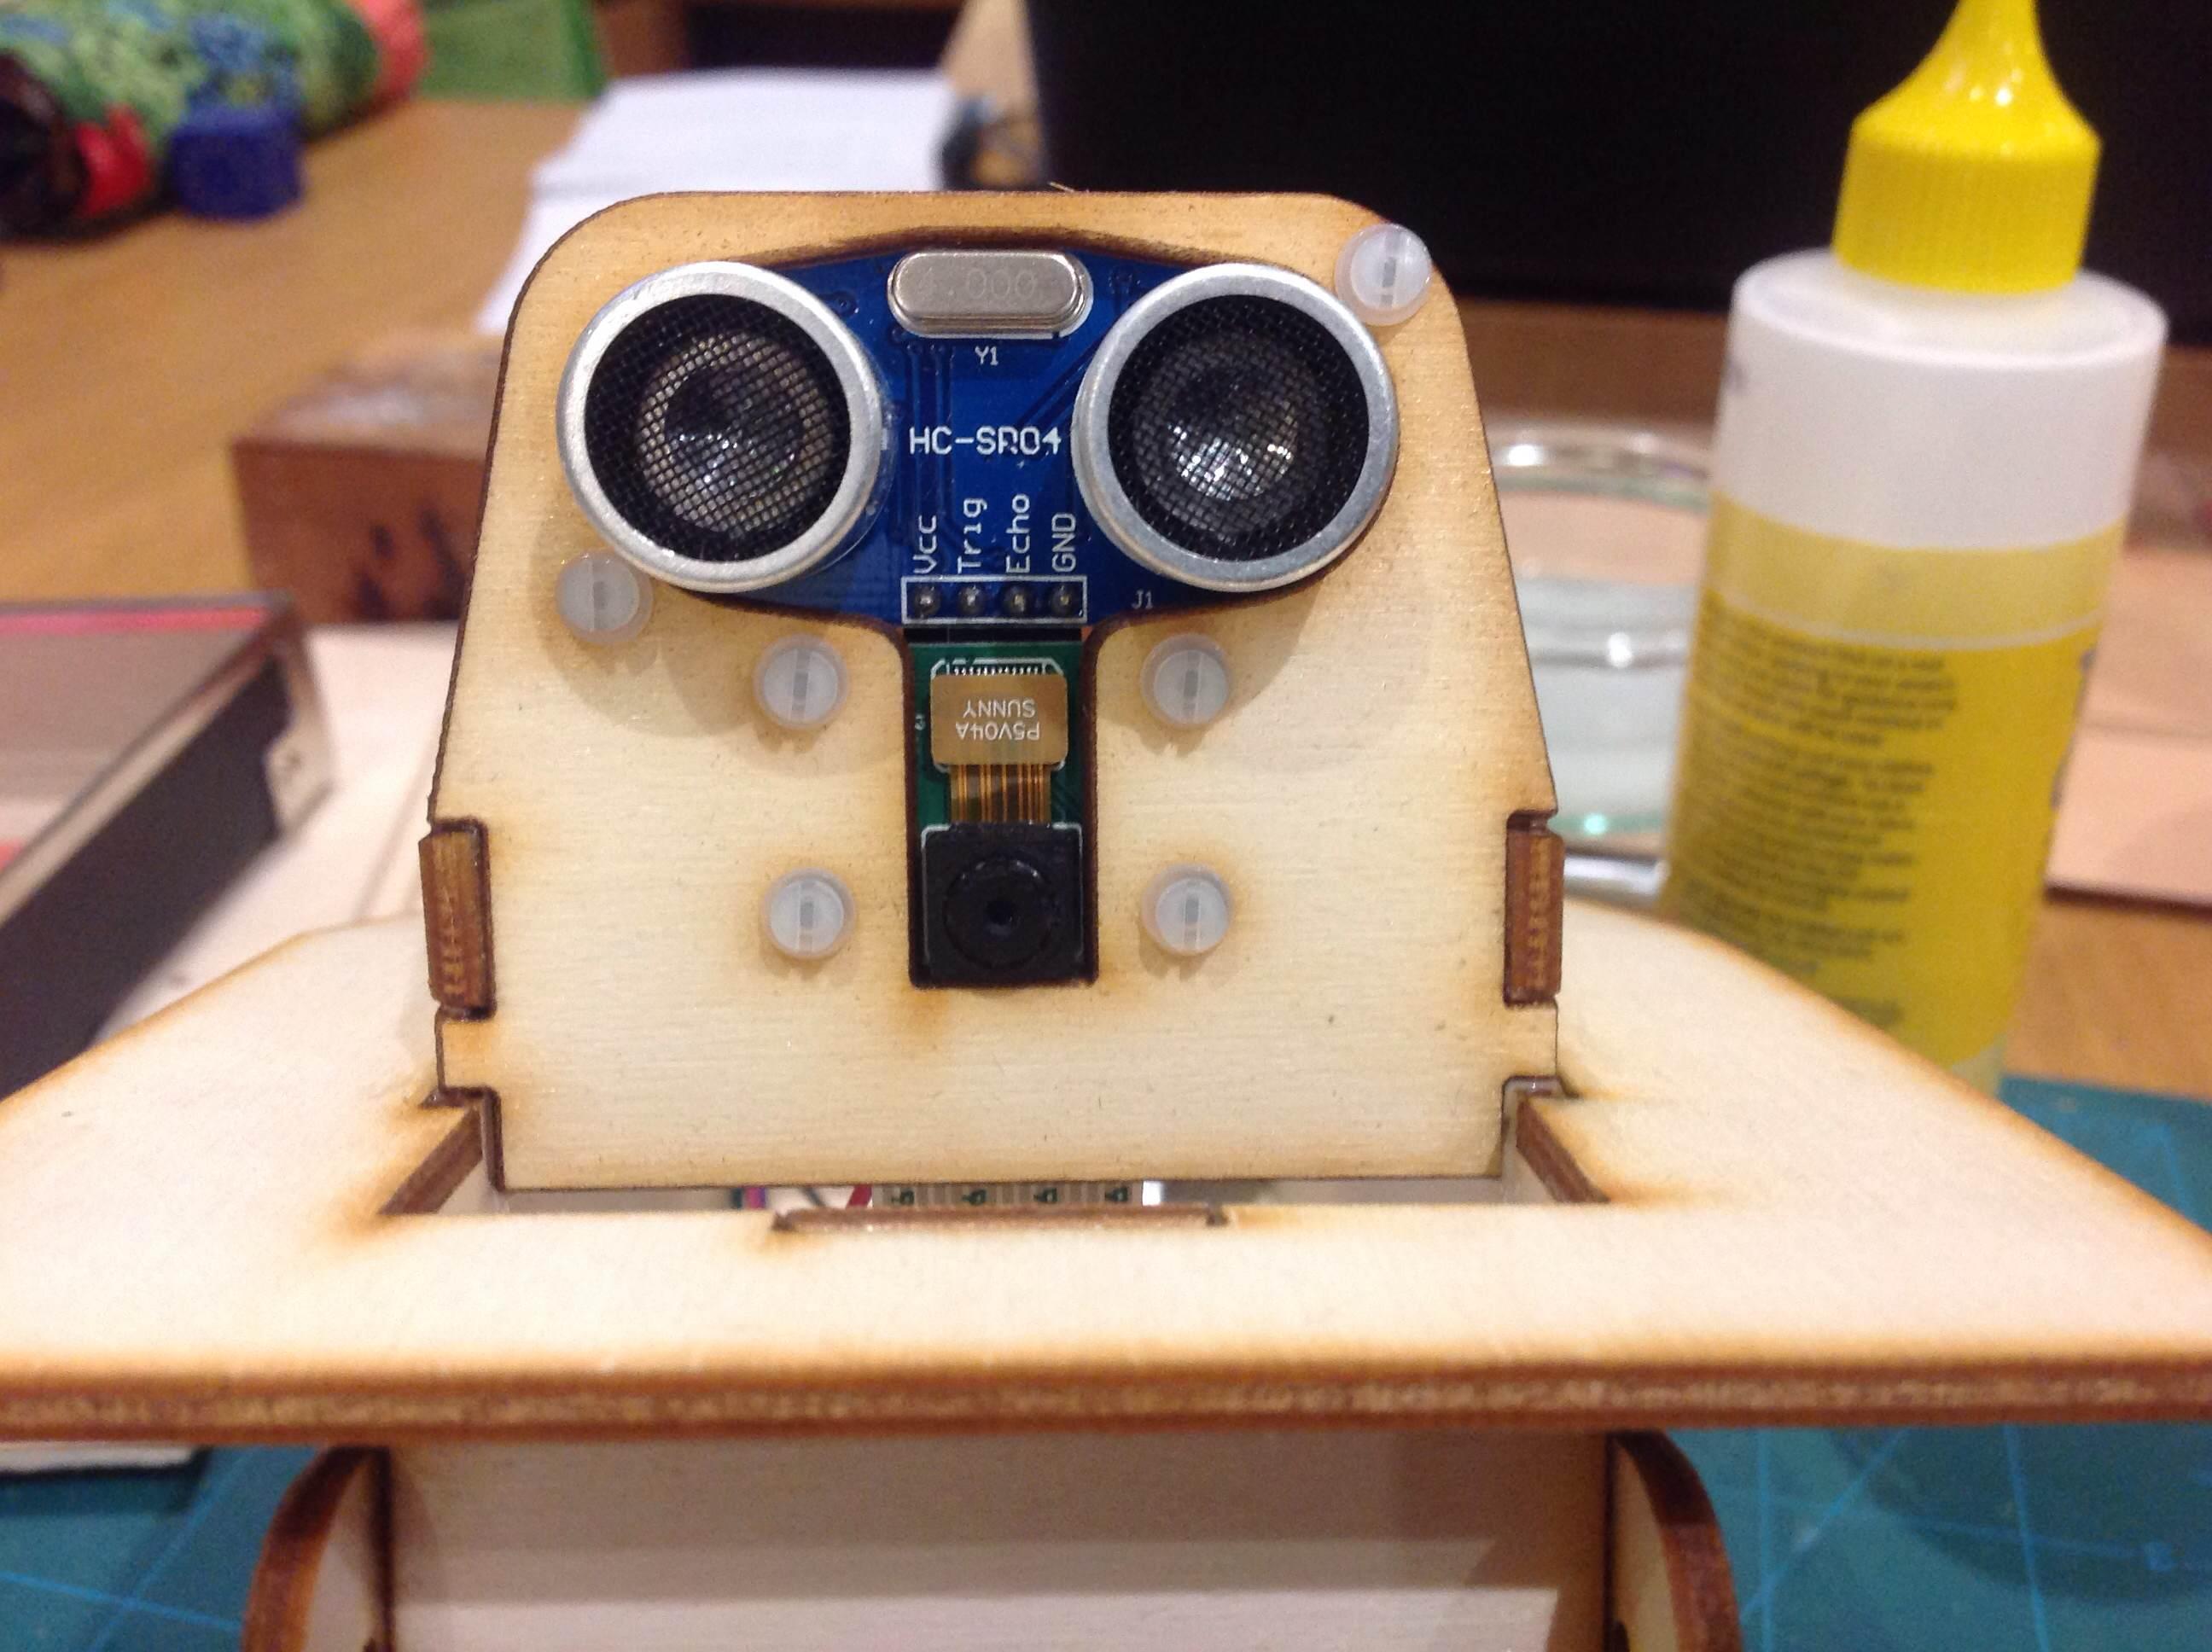 KEITH MK4 front sensors